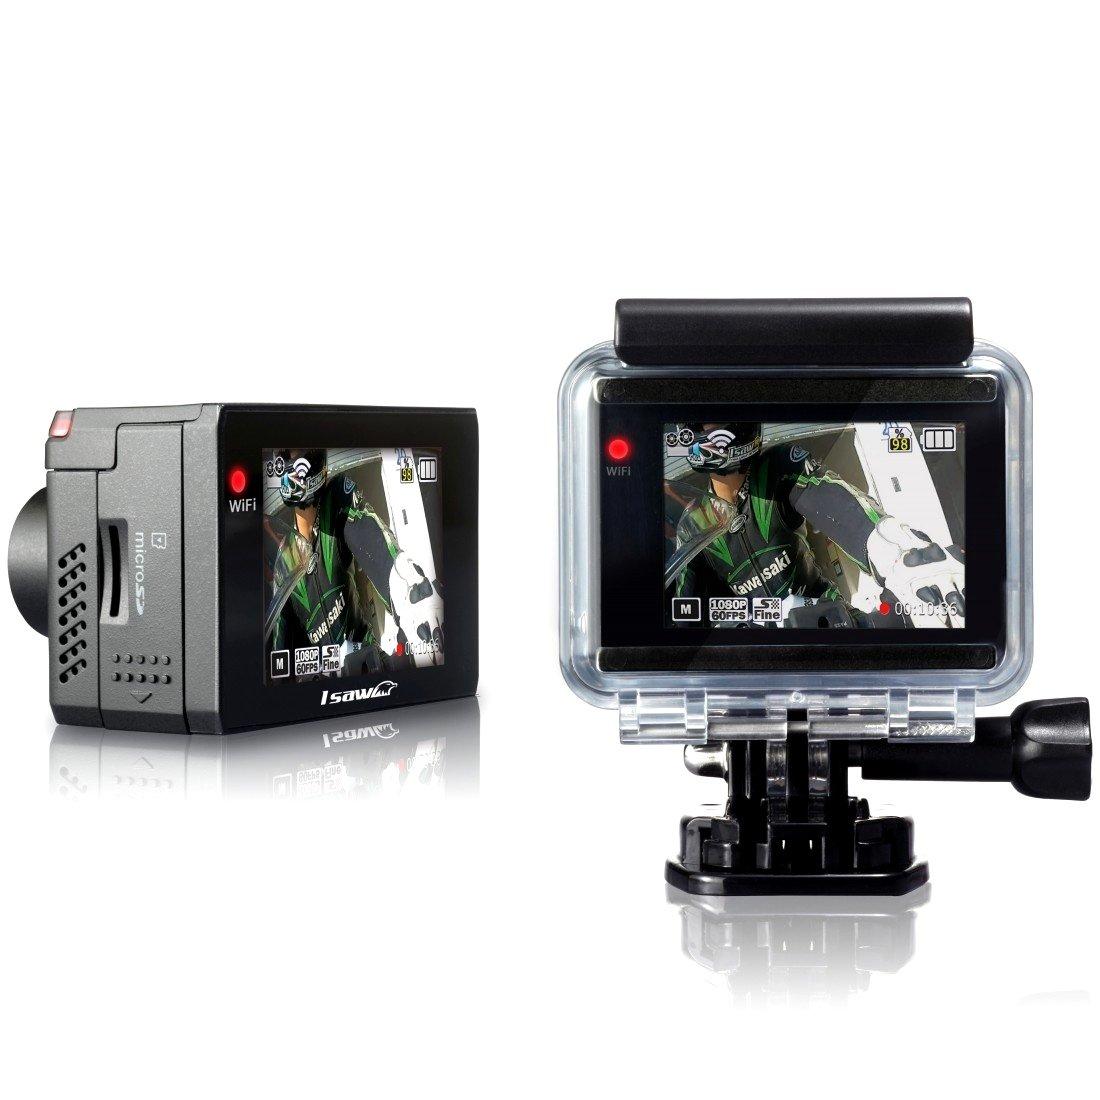 ISAW A3 Extreme Action Camera (Similar to GoPro Hero 3+